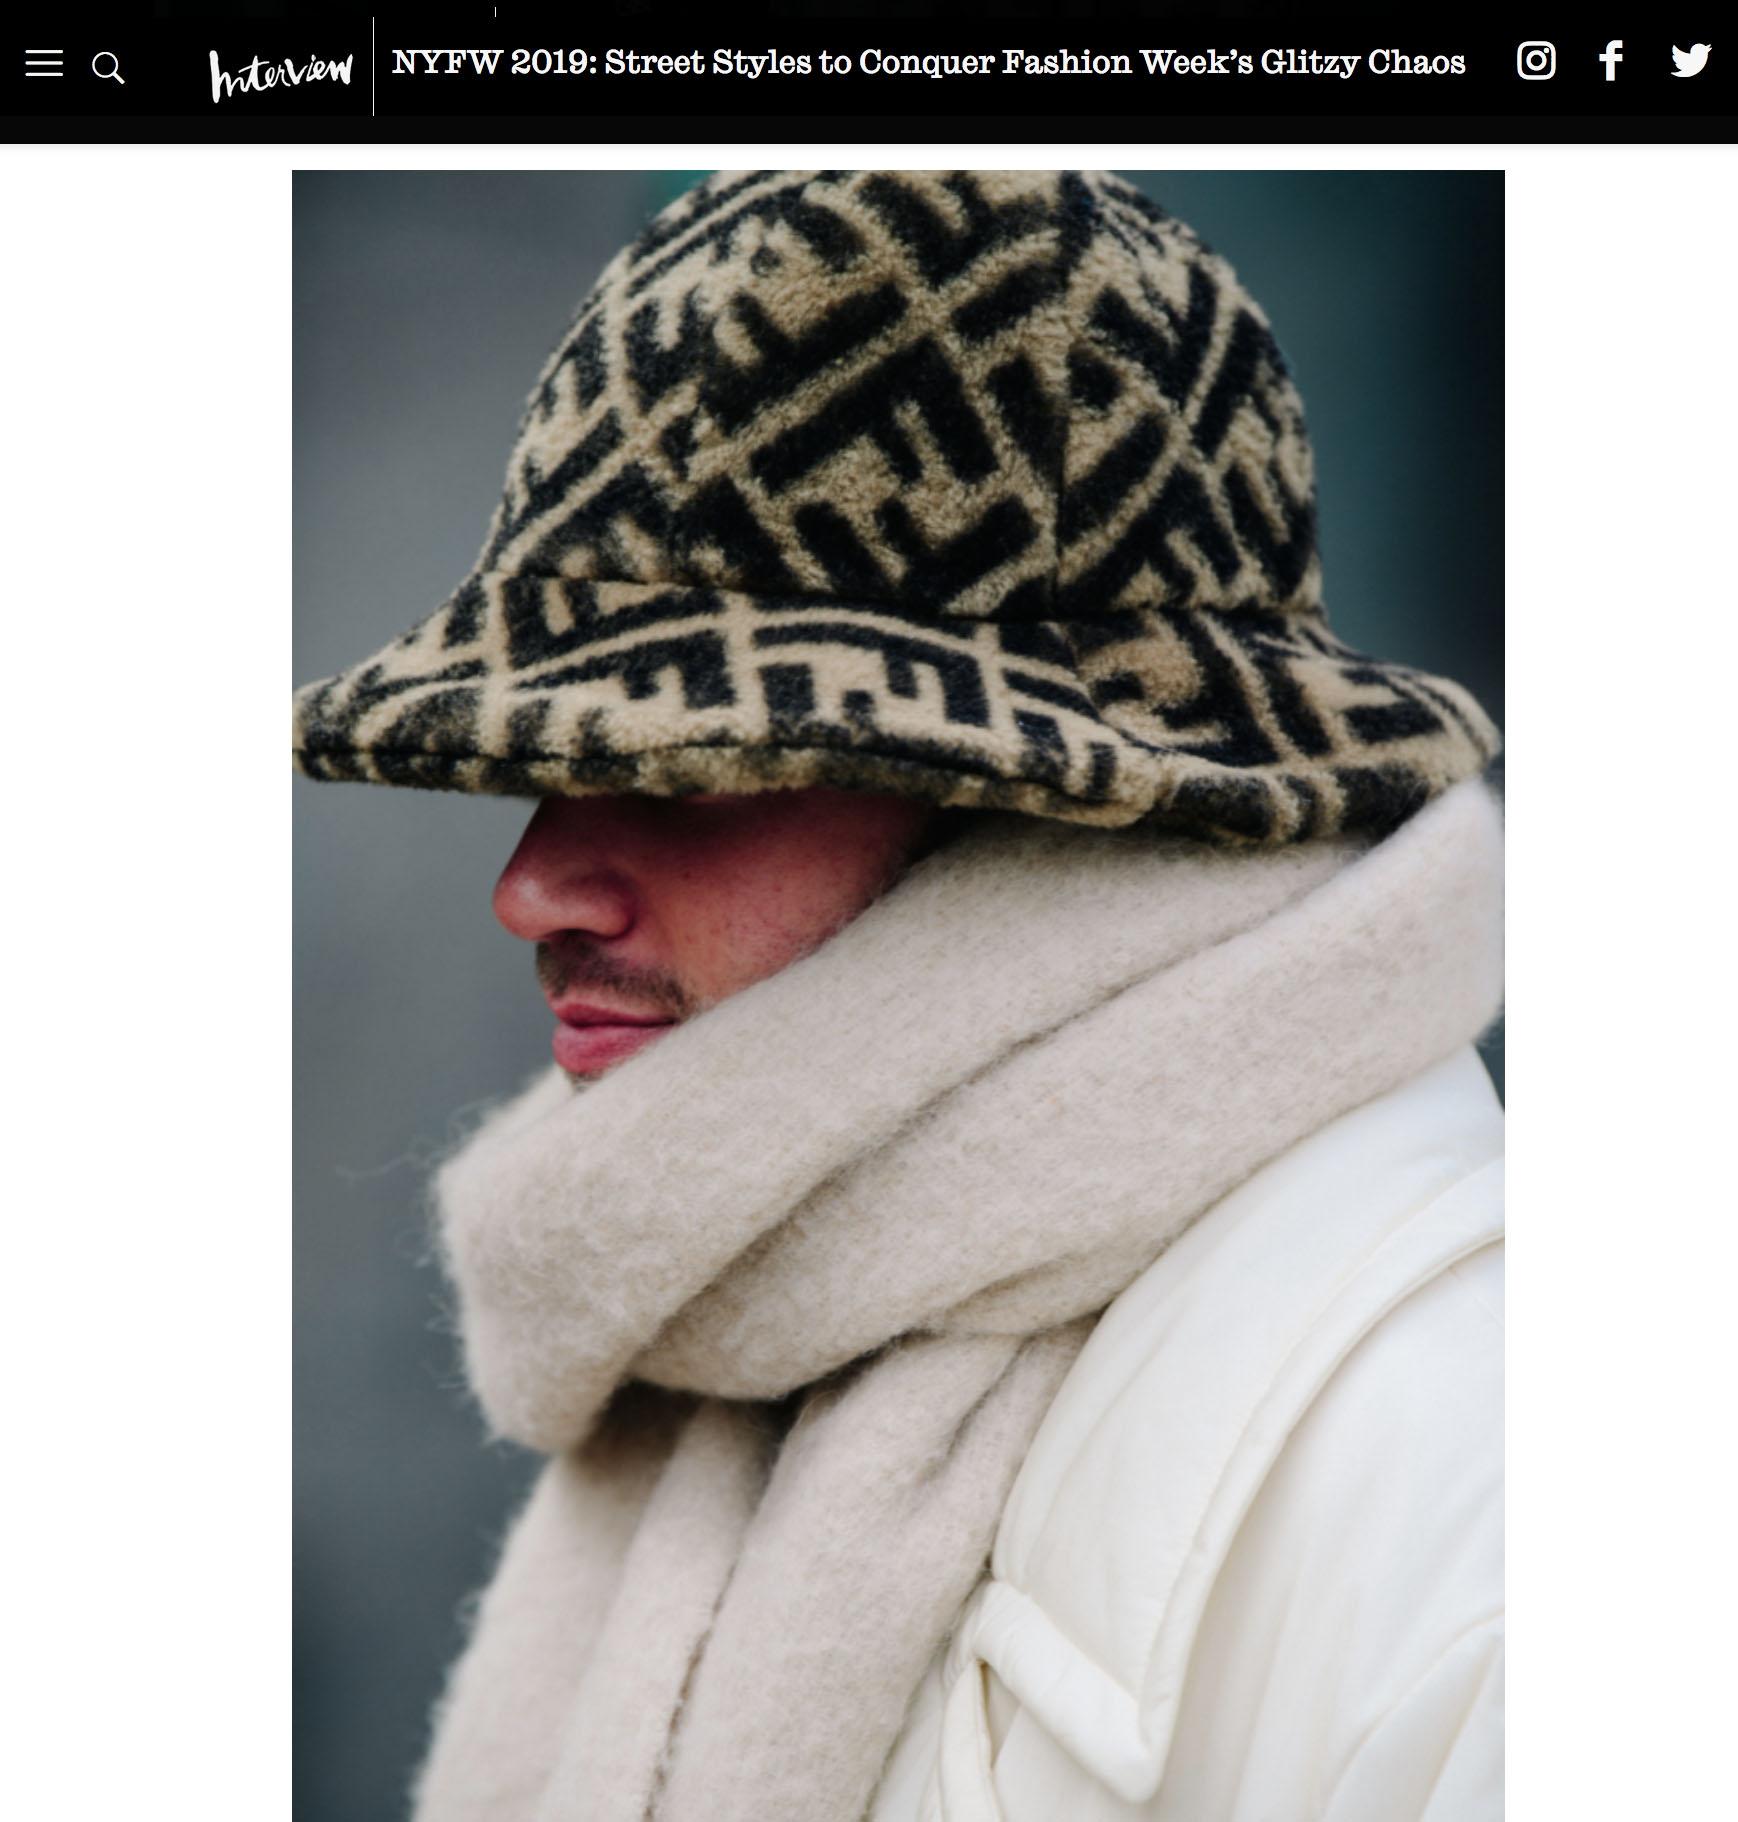 fendi fashion week street style